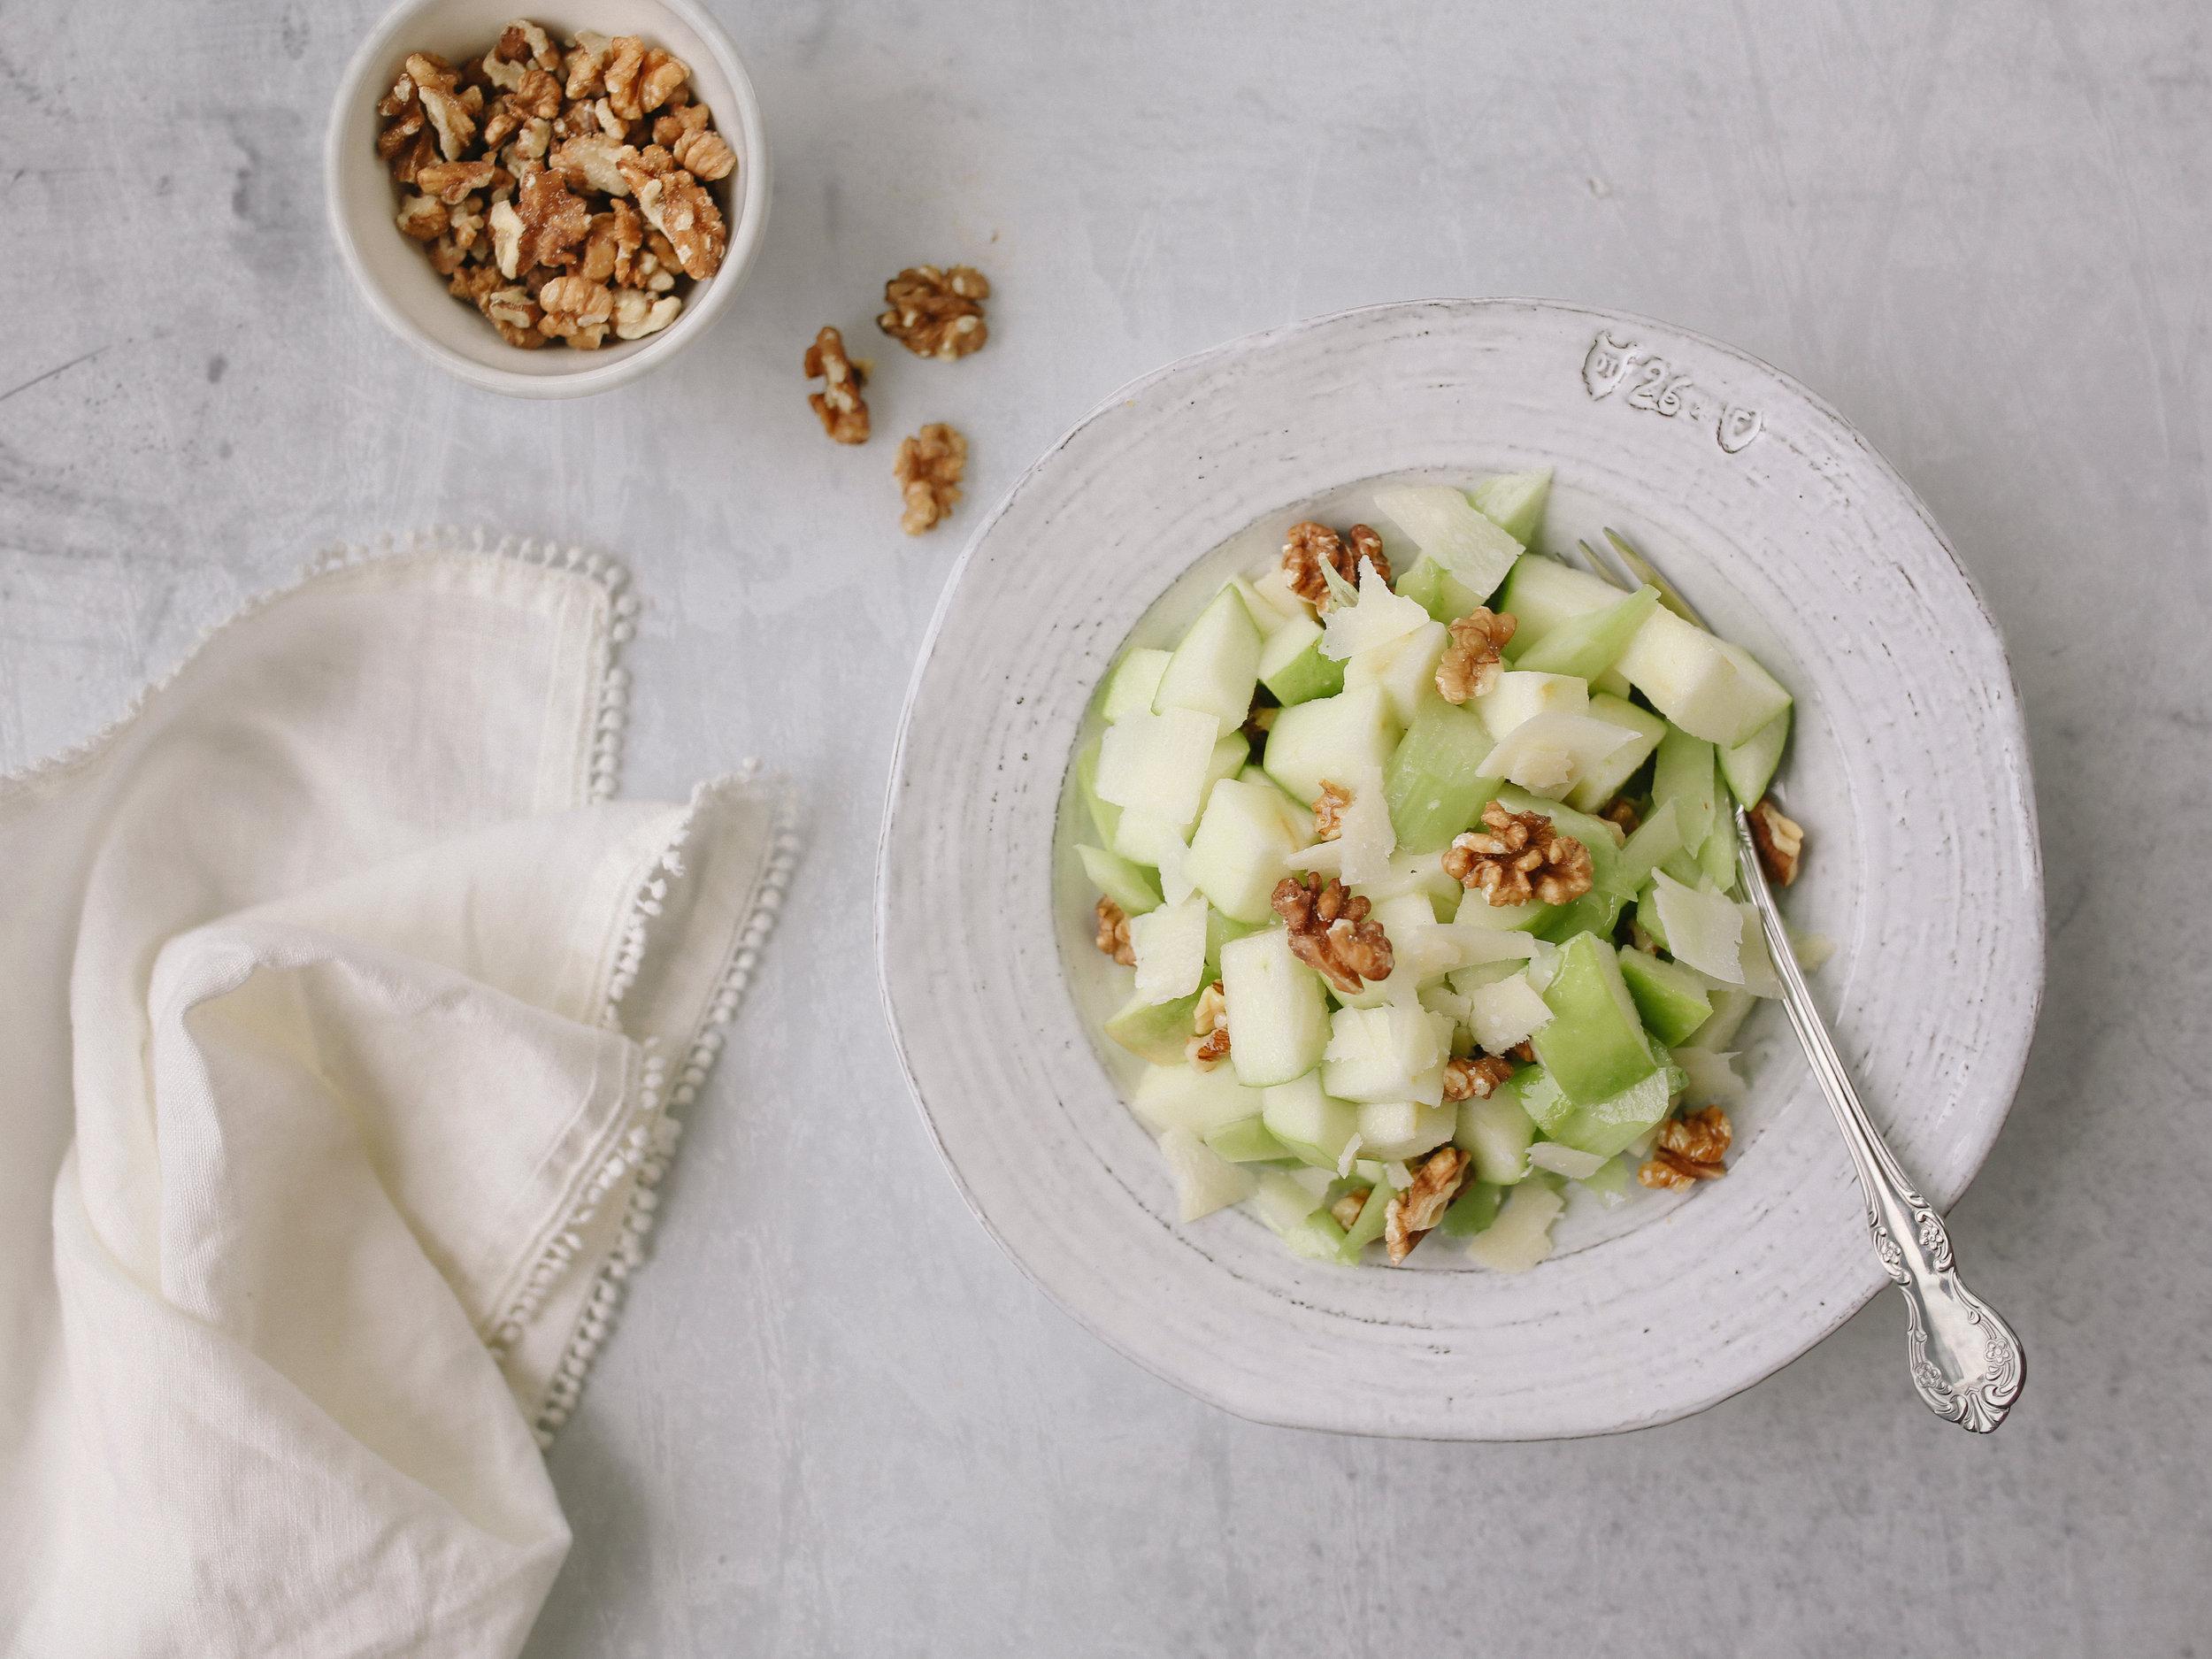 laurennicolefoot-2018-recipes-apple-salad-2 copy.jpg